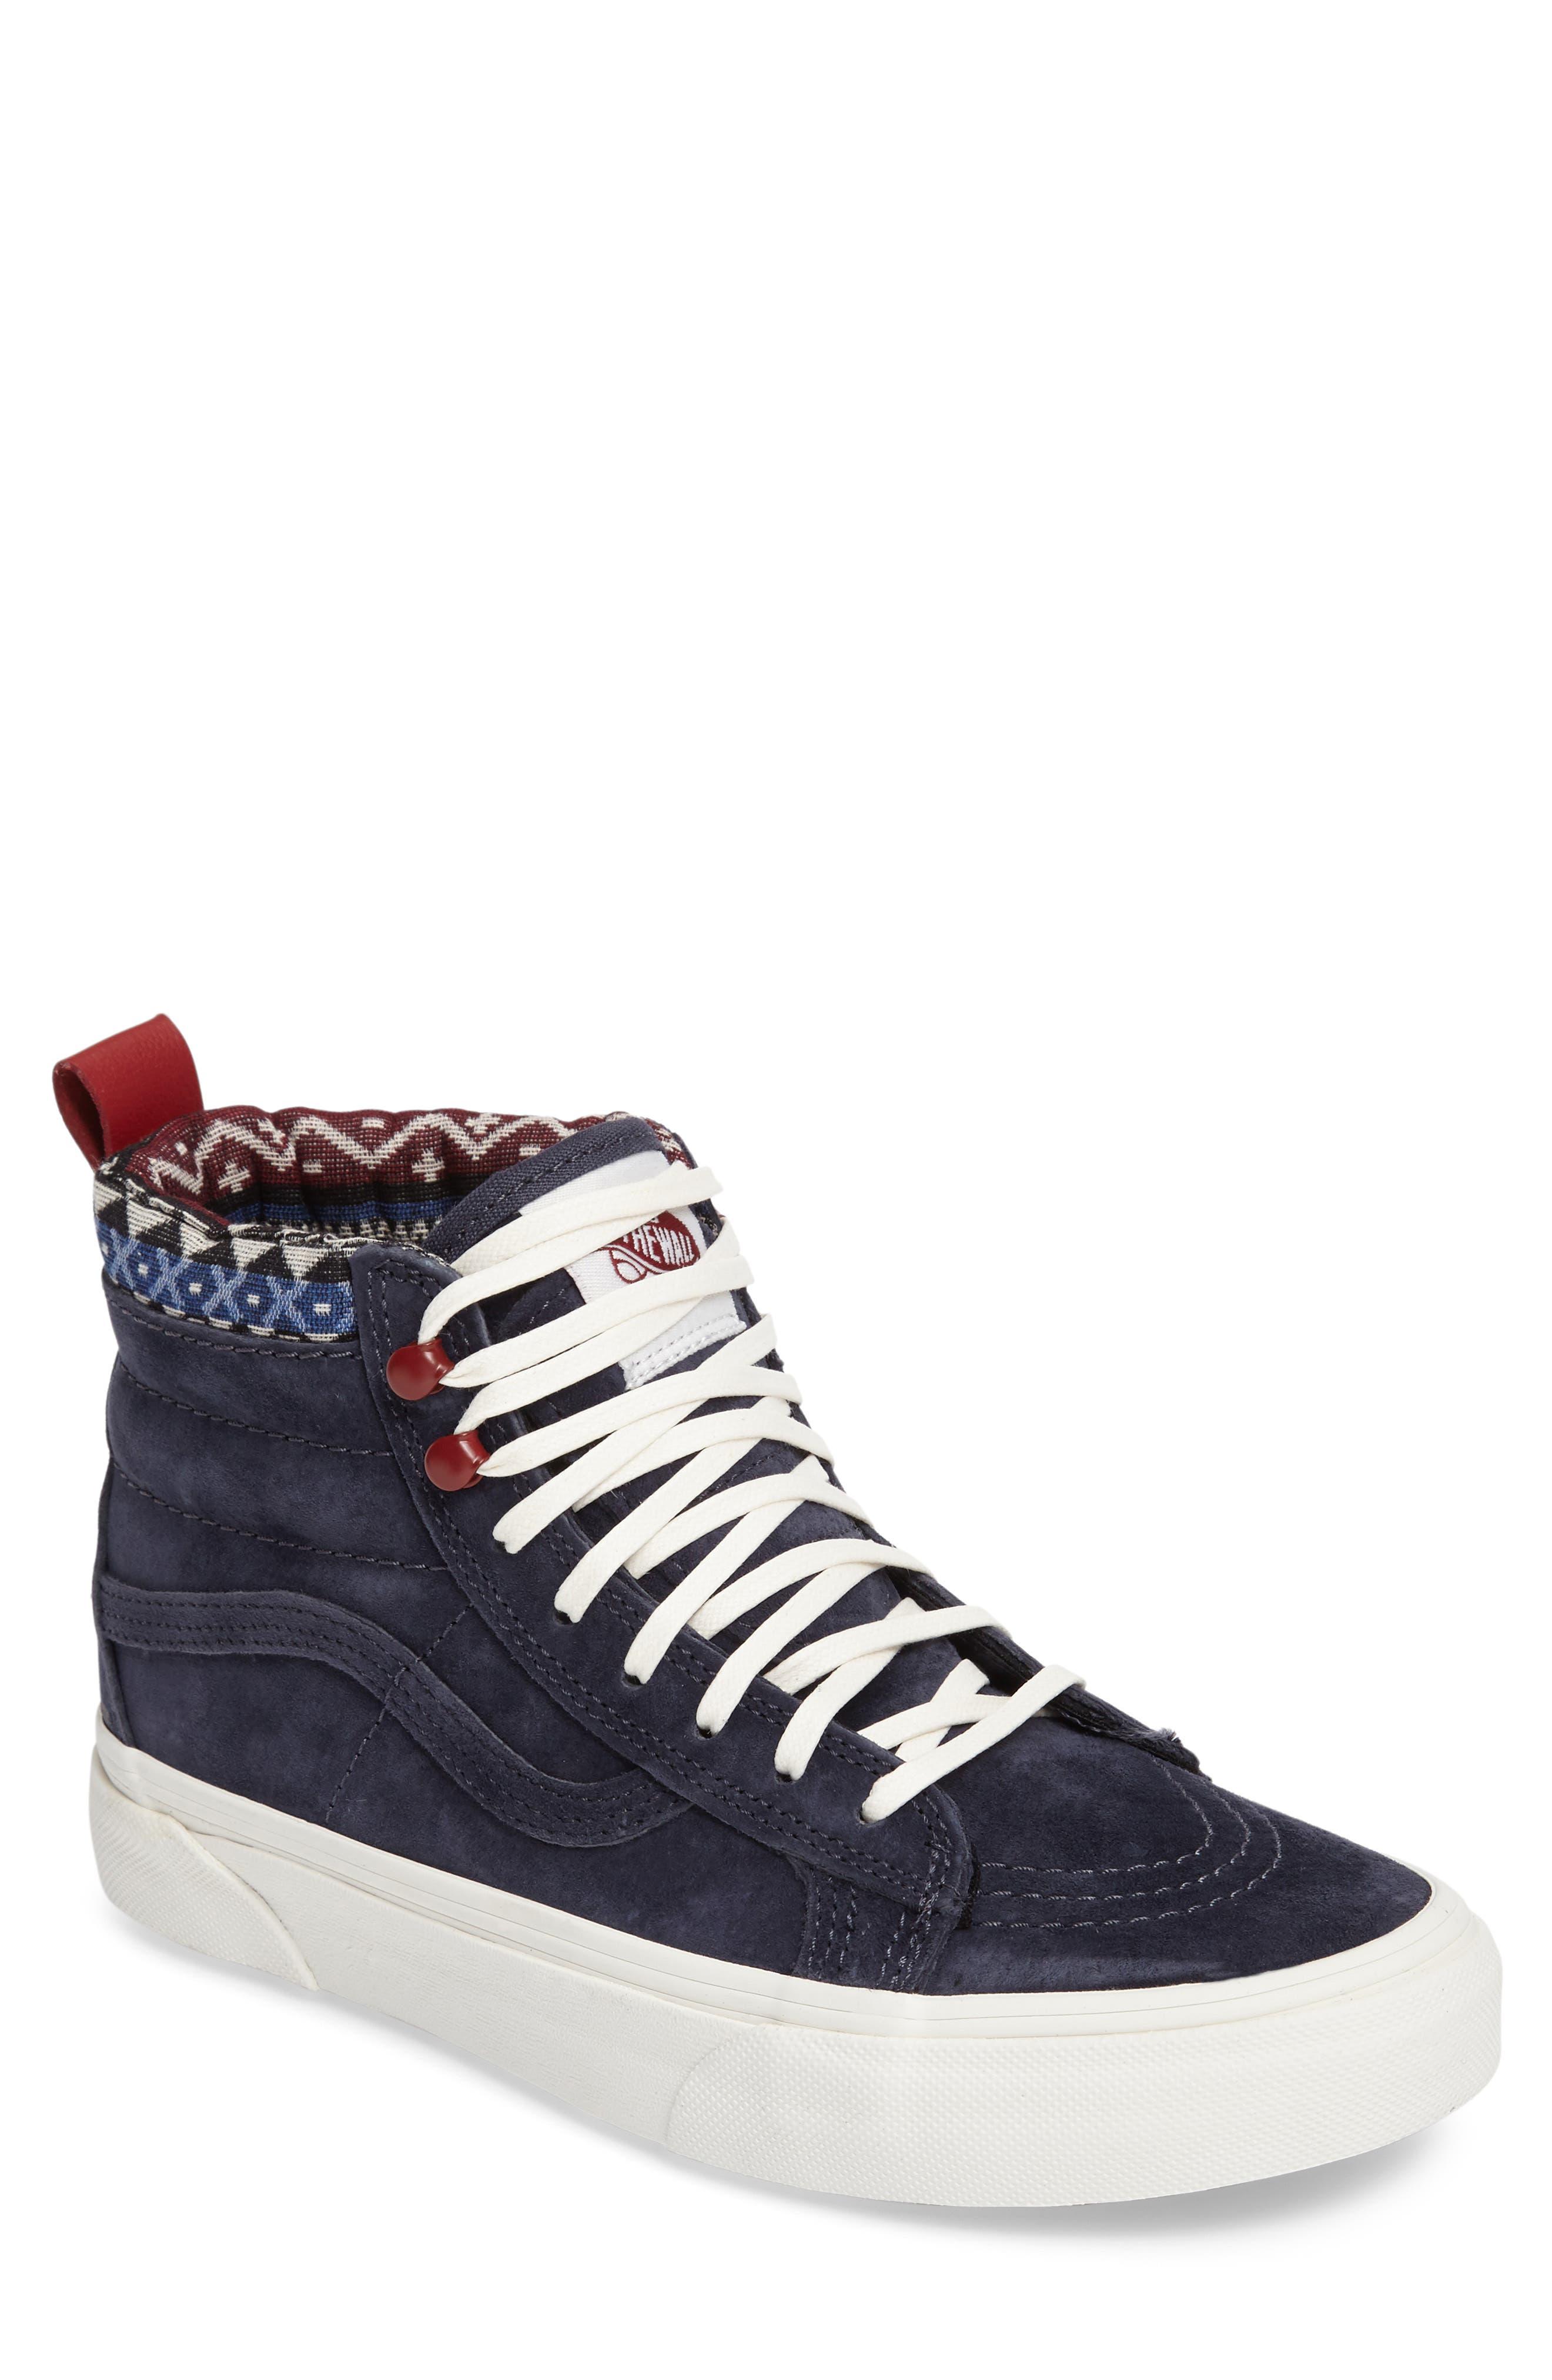 Sk-8 Hi MTE Sneaker,                             Main thumbnail 1, color,                             Parisian Night/ Blue Suede